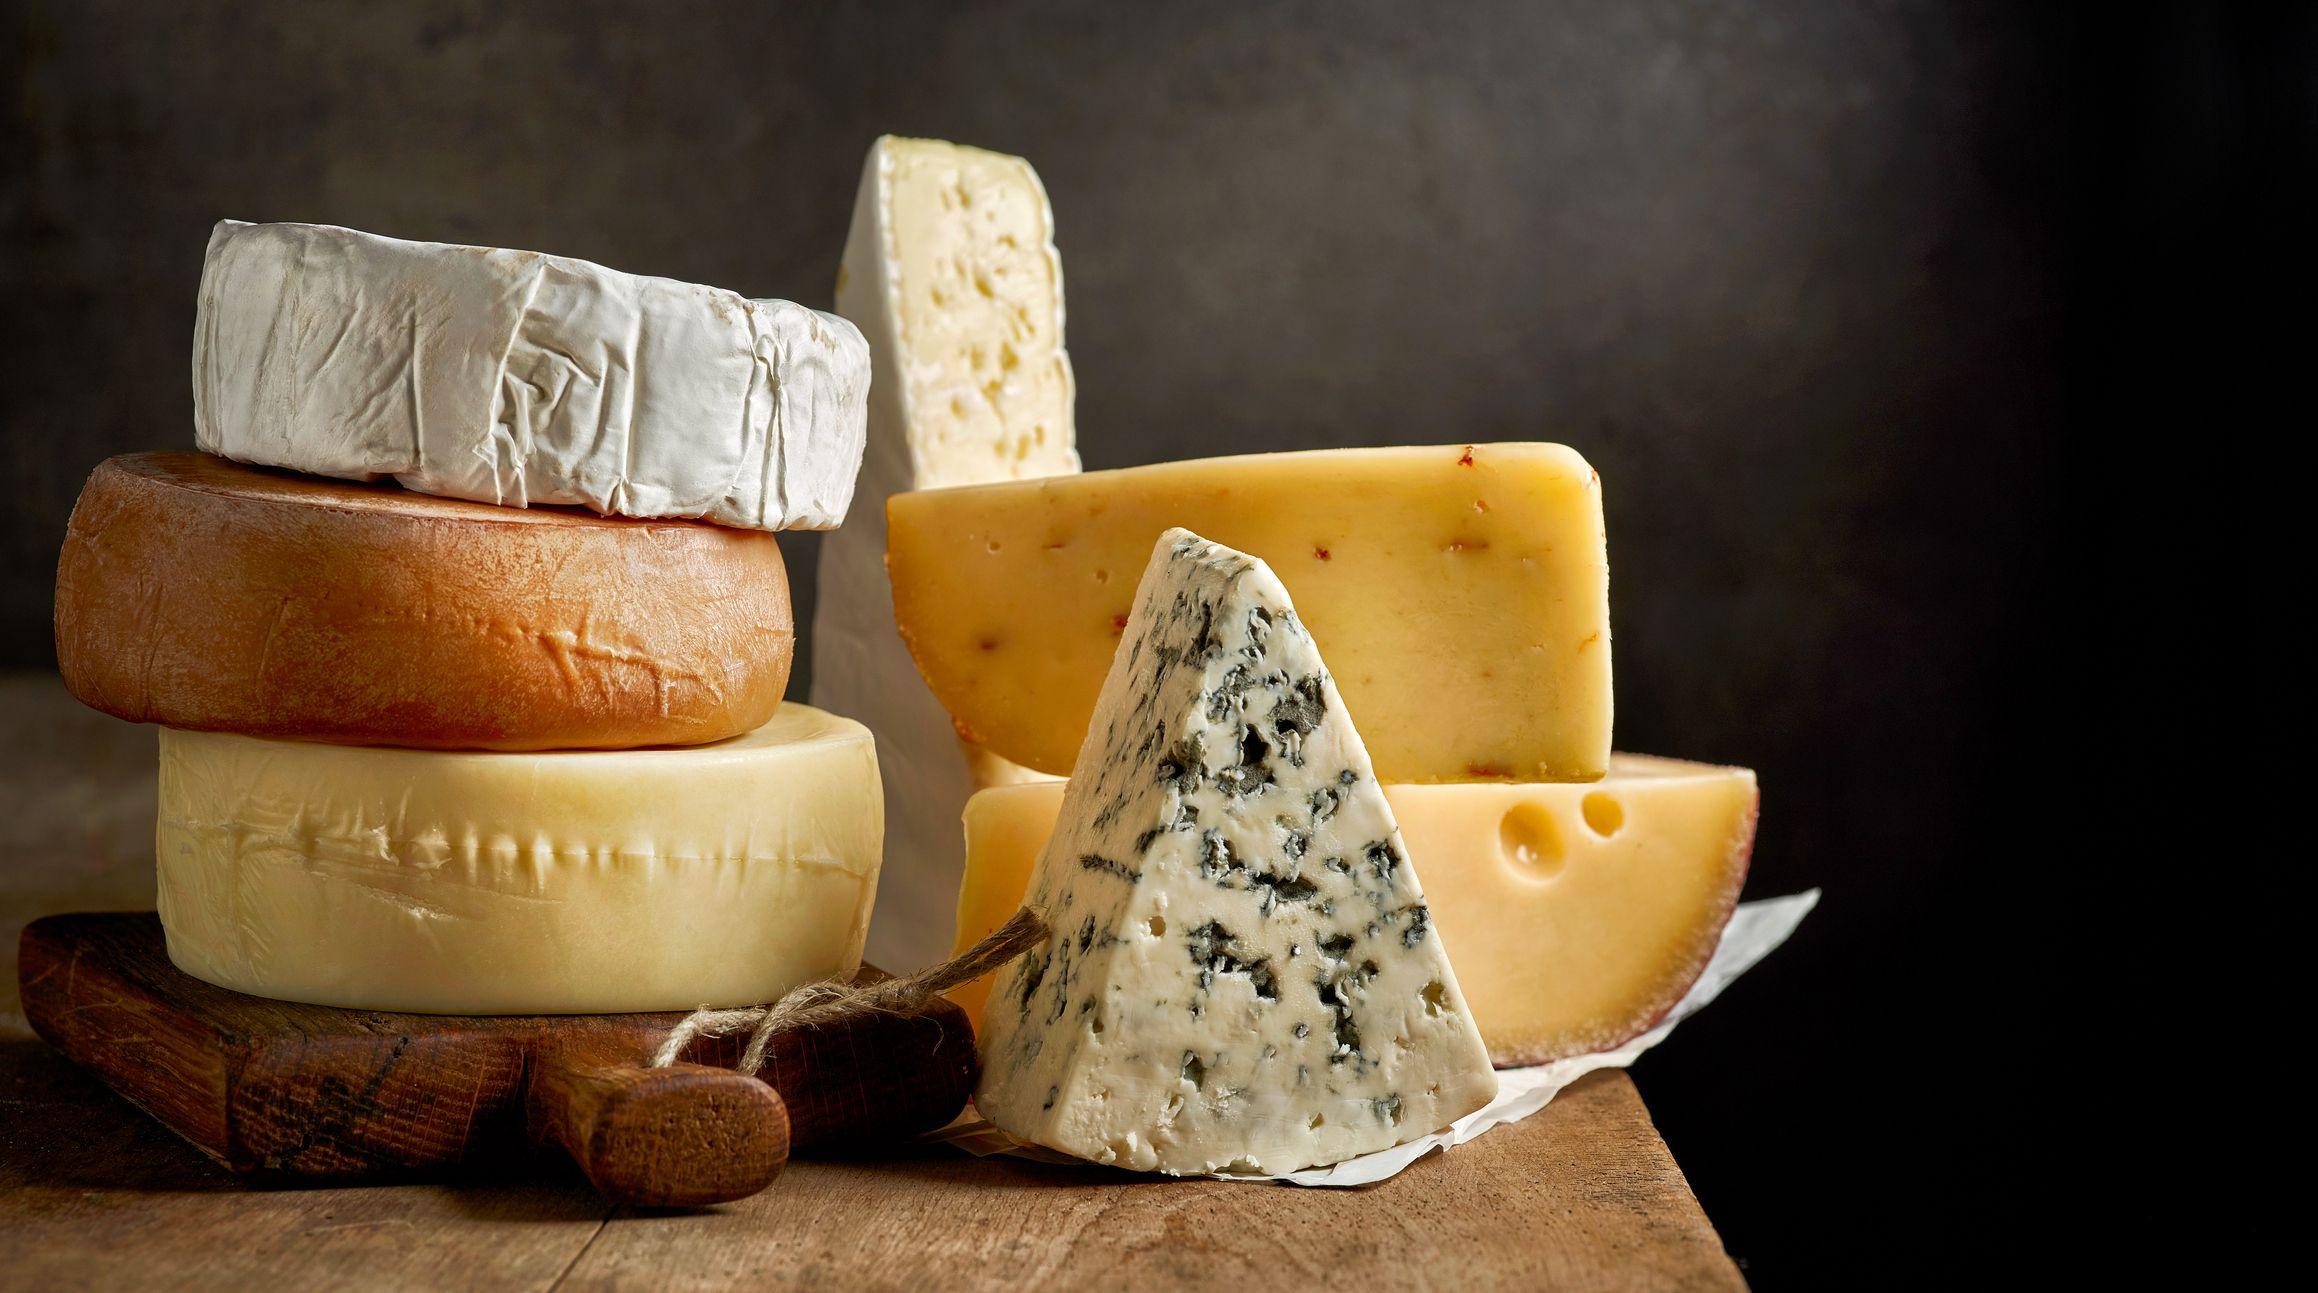 10_17_Cheese